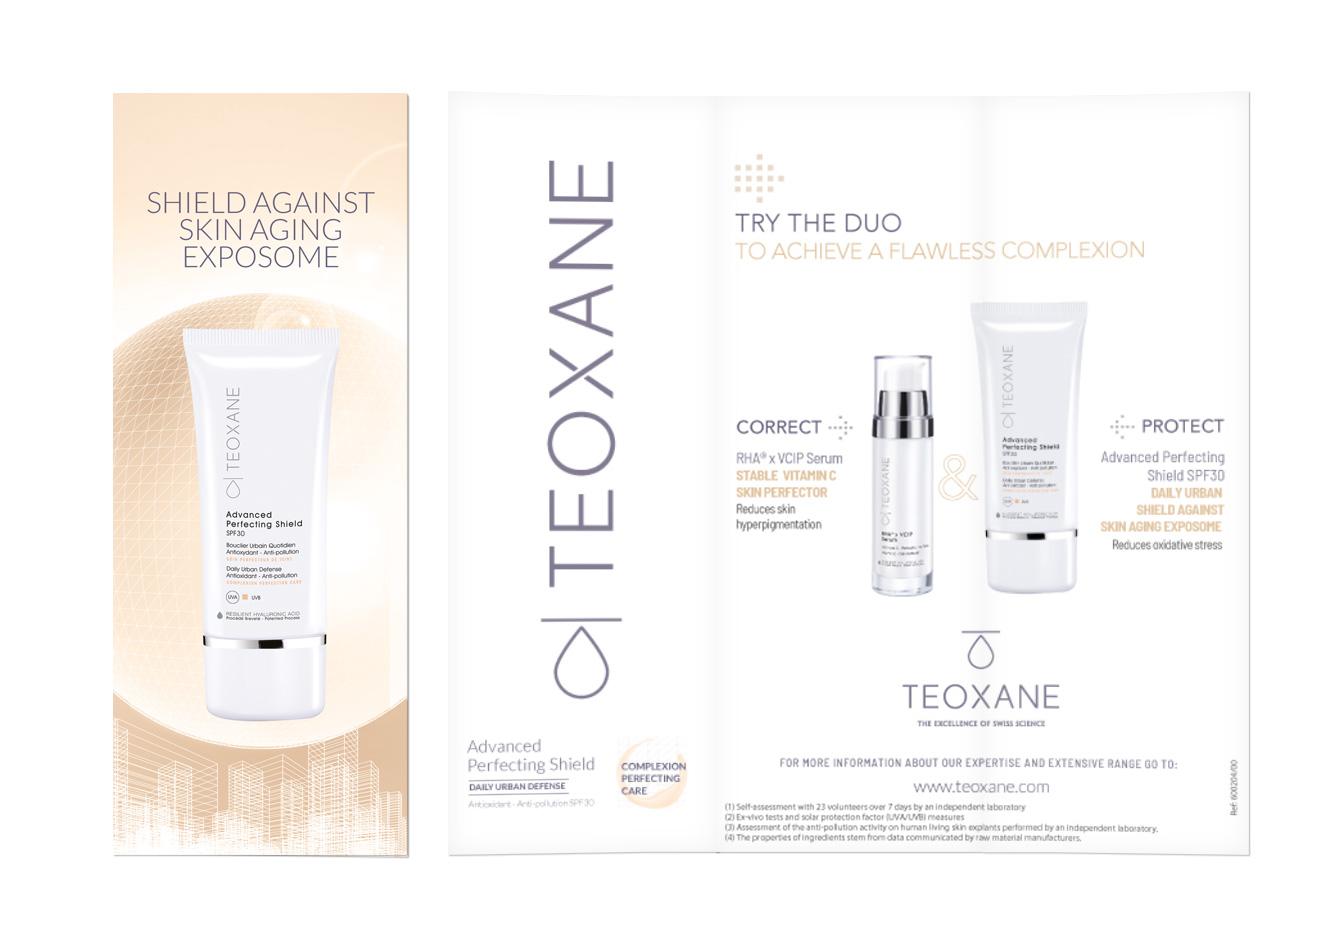 teoxane-visuel-campagne-agence-communication-medical-karma-sante-nice-paris-18